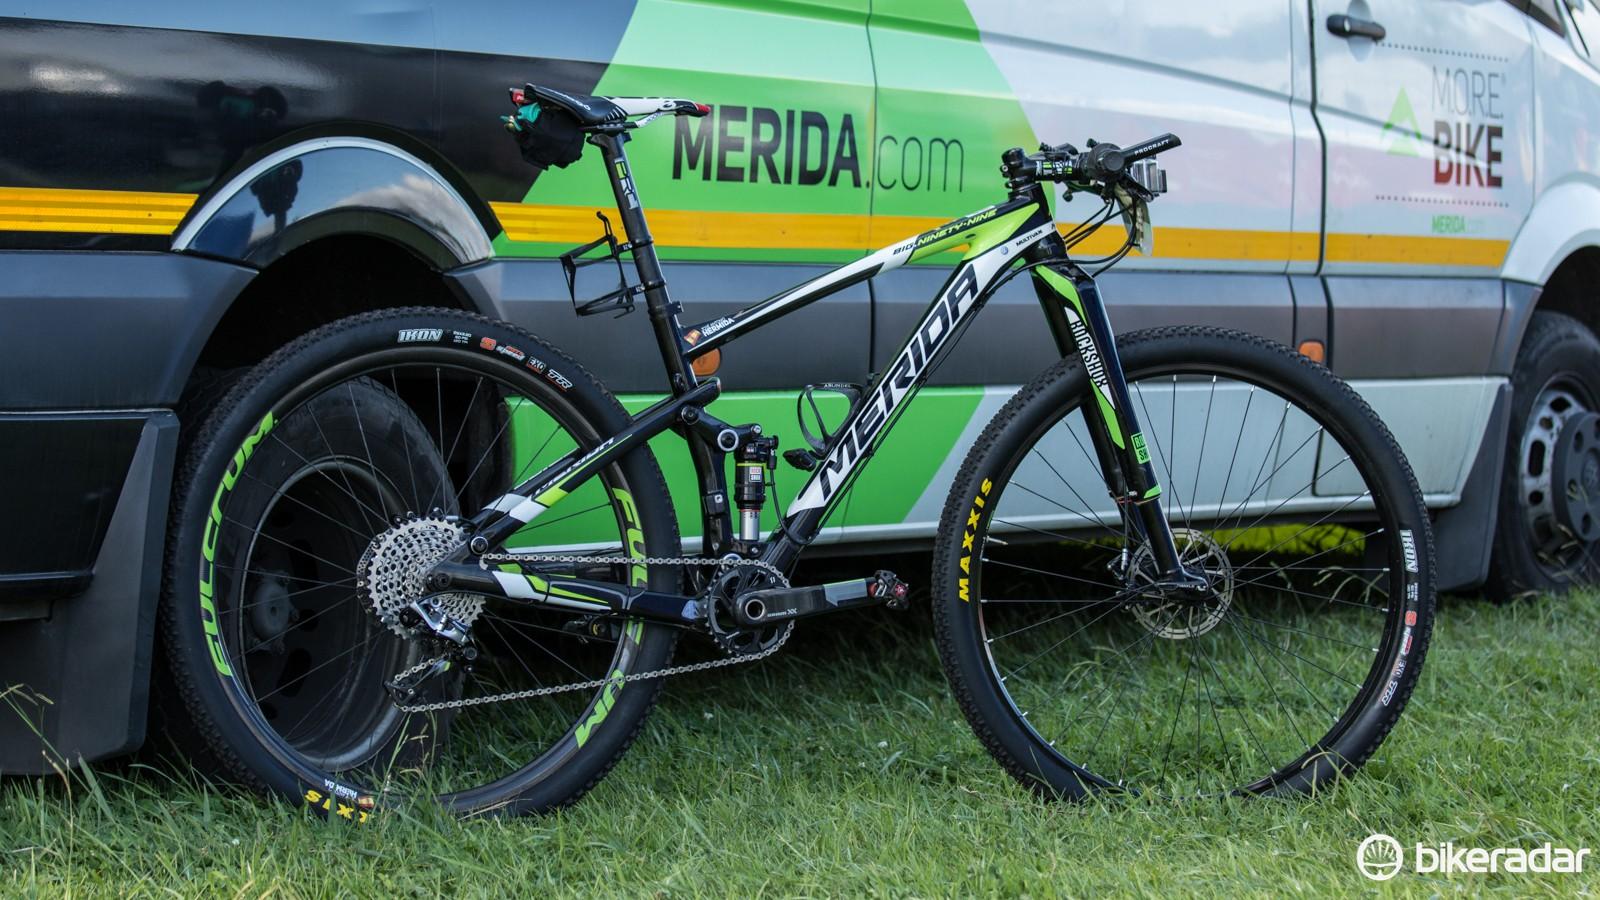 José Antonio Hermida rode a Merida Ninety-Nine 9.Team at the 2015 Absa Cape Epic